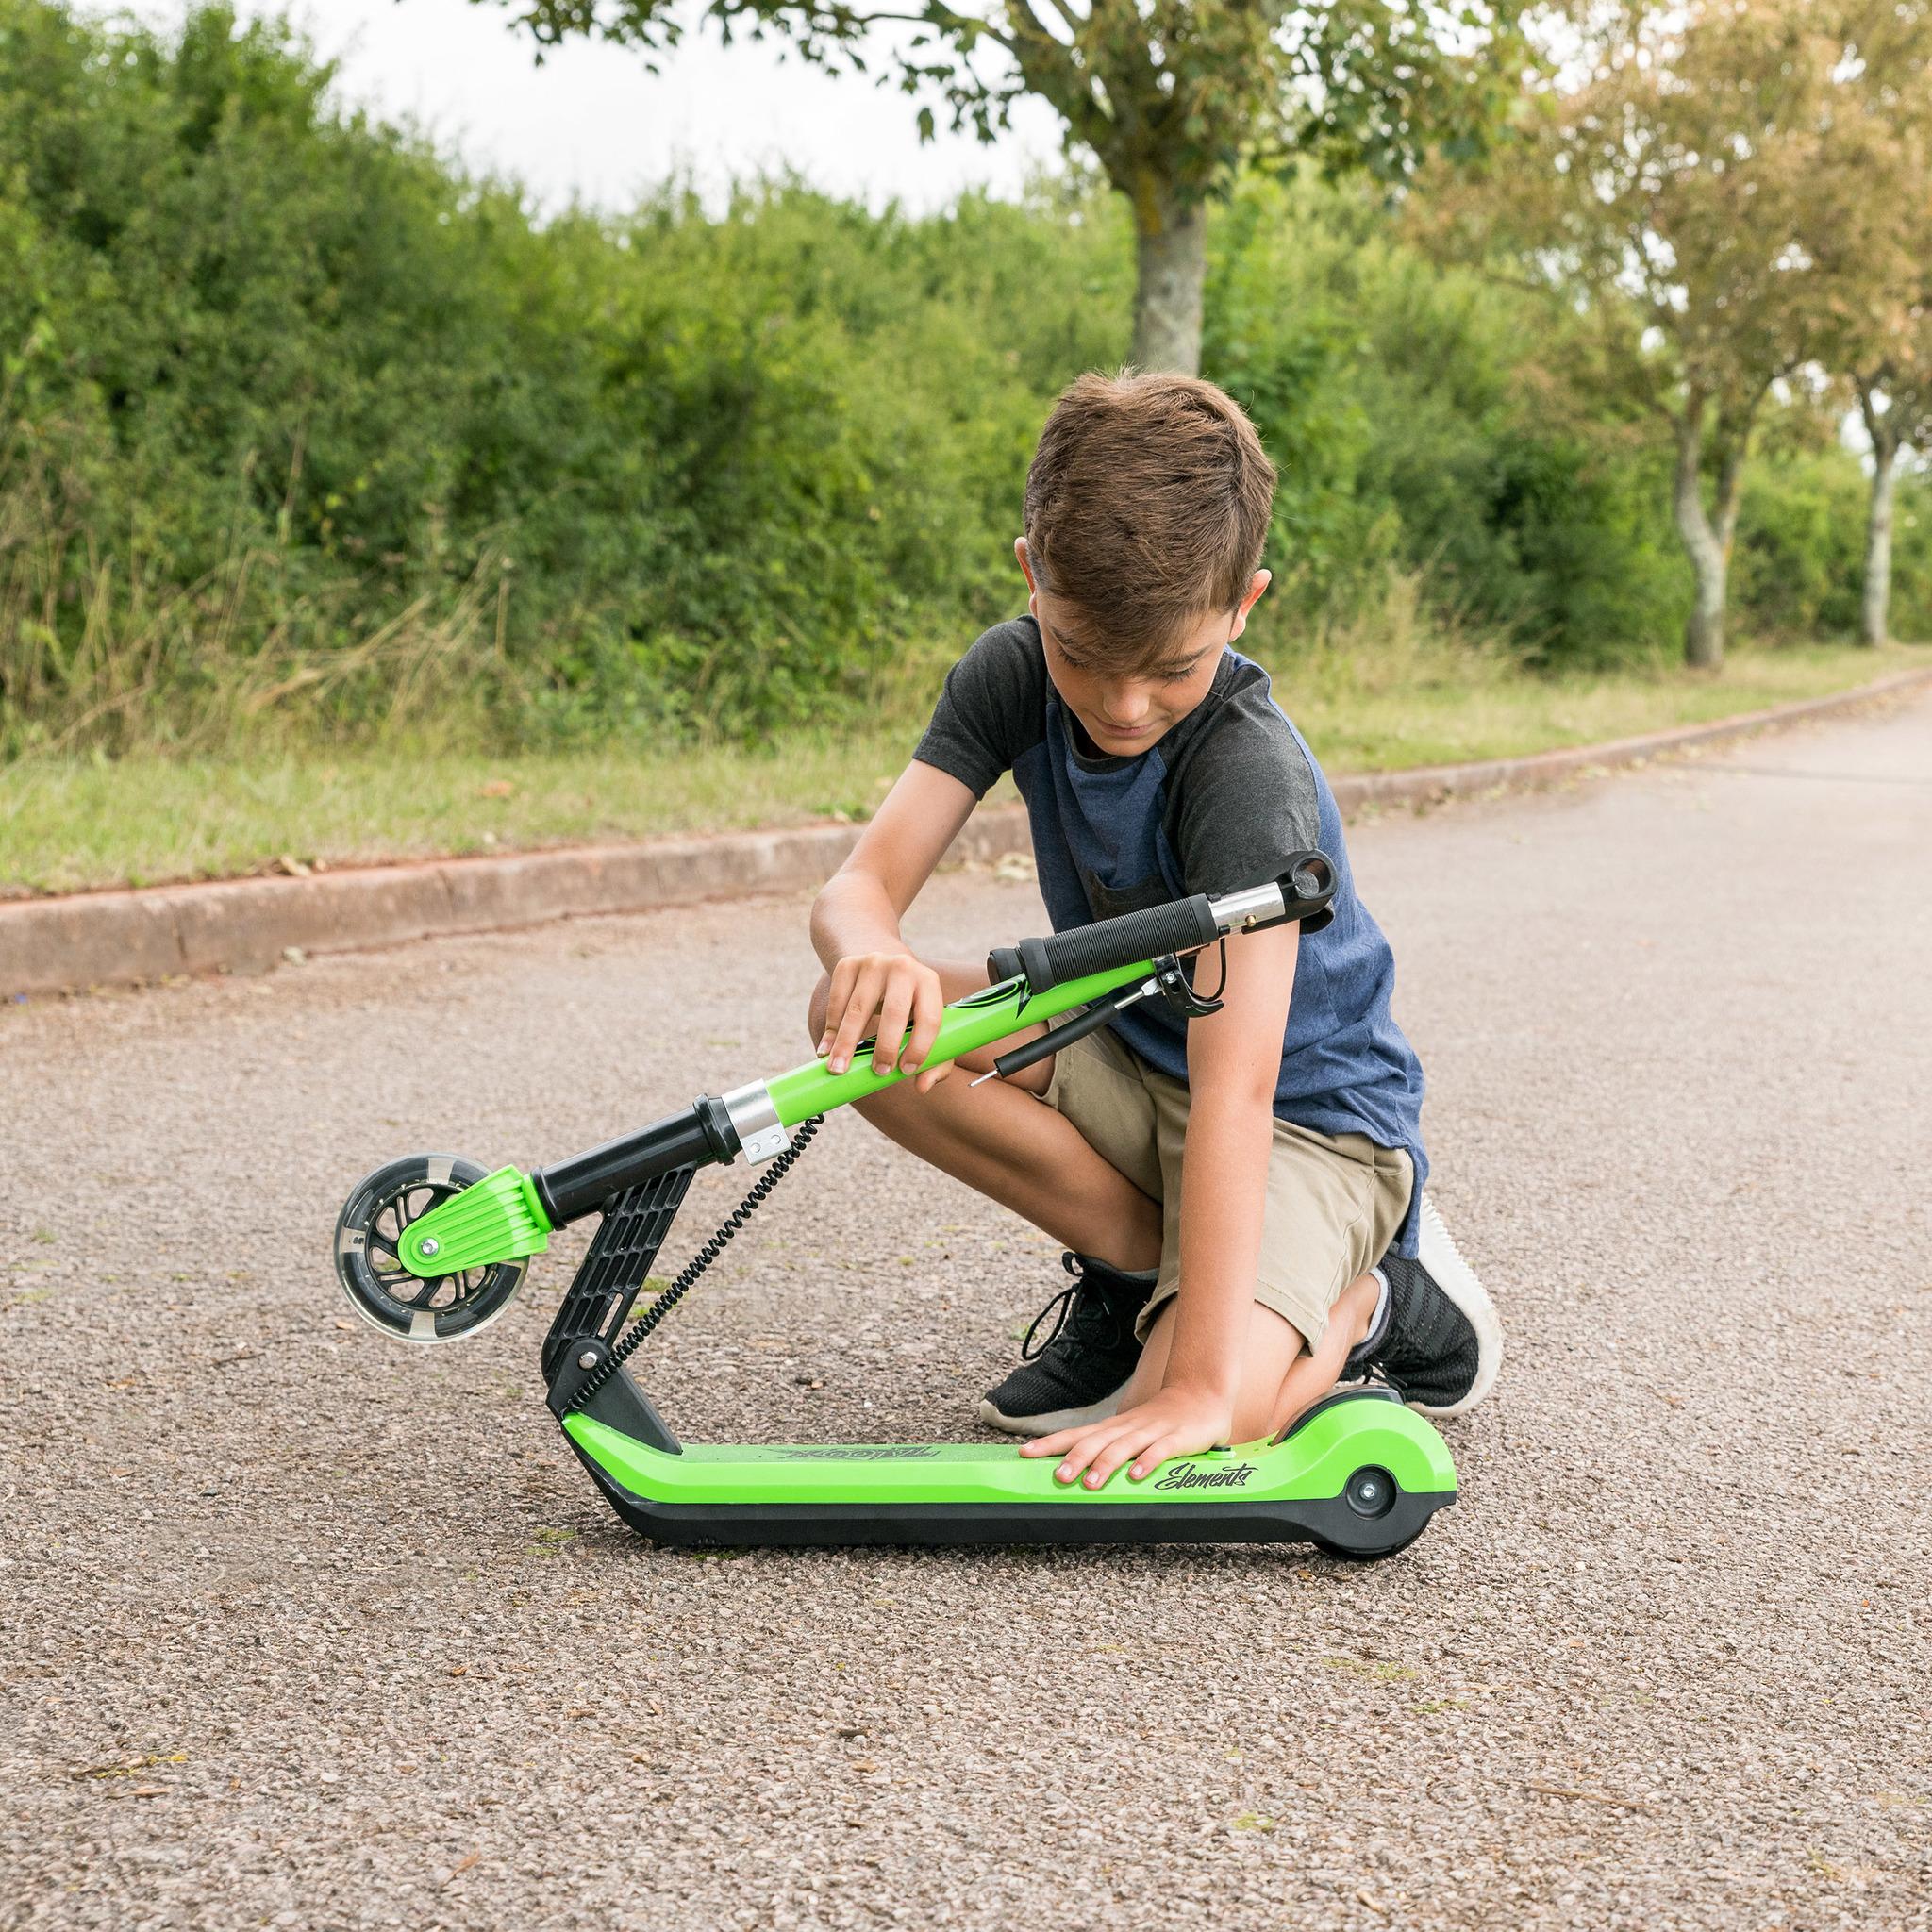 Электросамокат Xootz Kids Elements, светящиеся колеса, зеленый